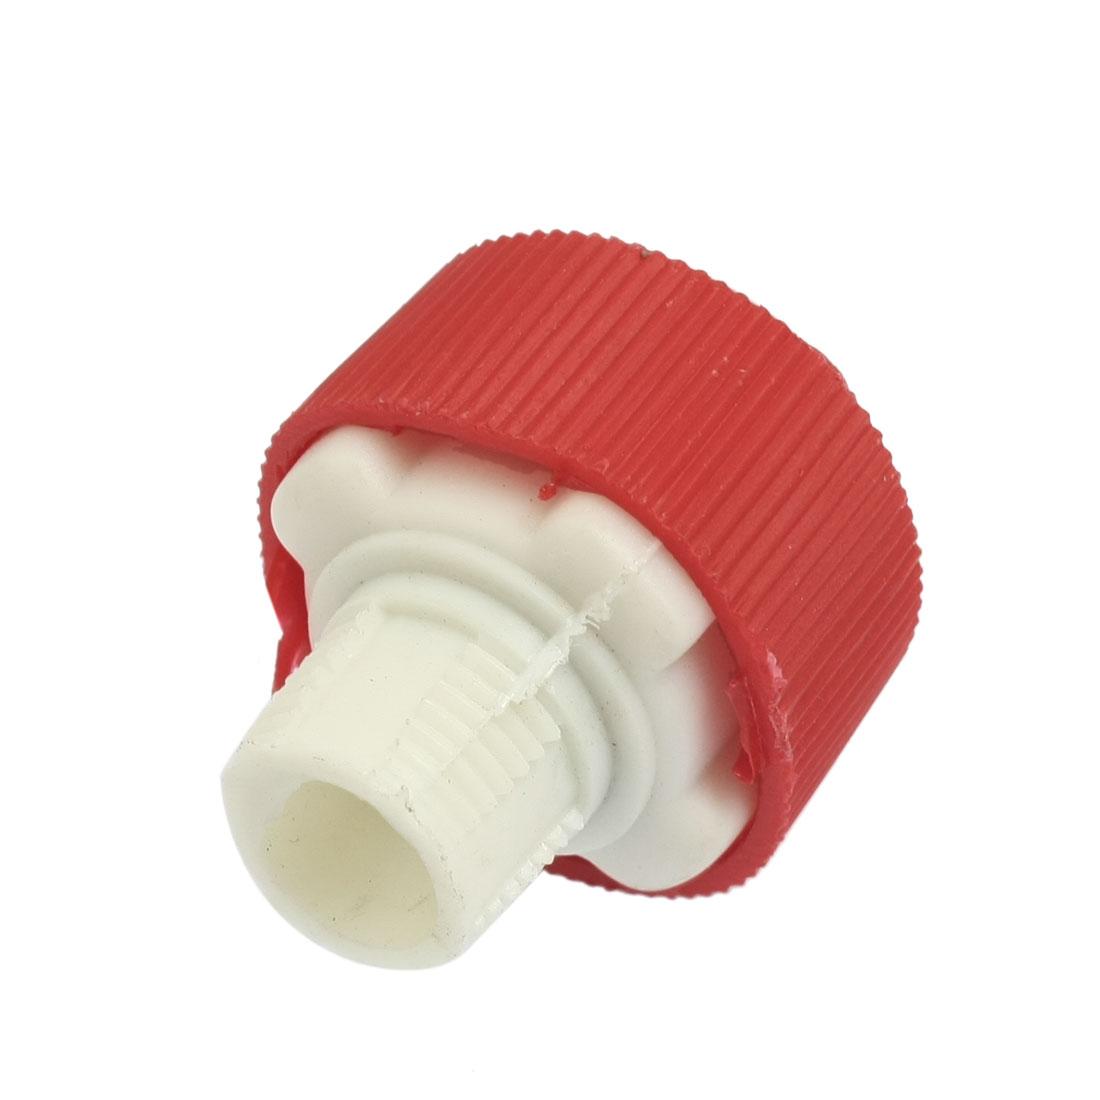 "Red White Plastic Air Exhaust Pneumatic Muffler Filter 1/2"" NPT Thread"